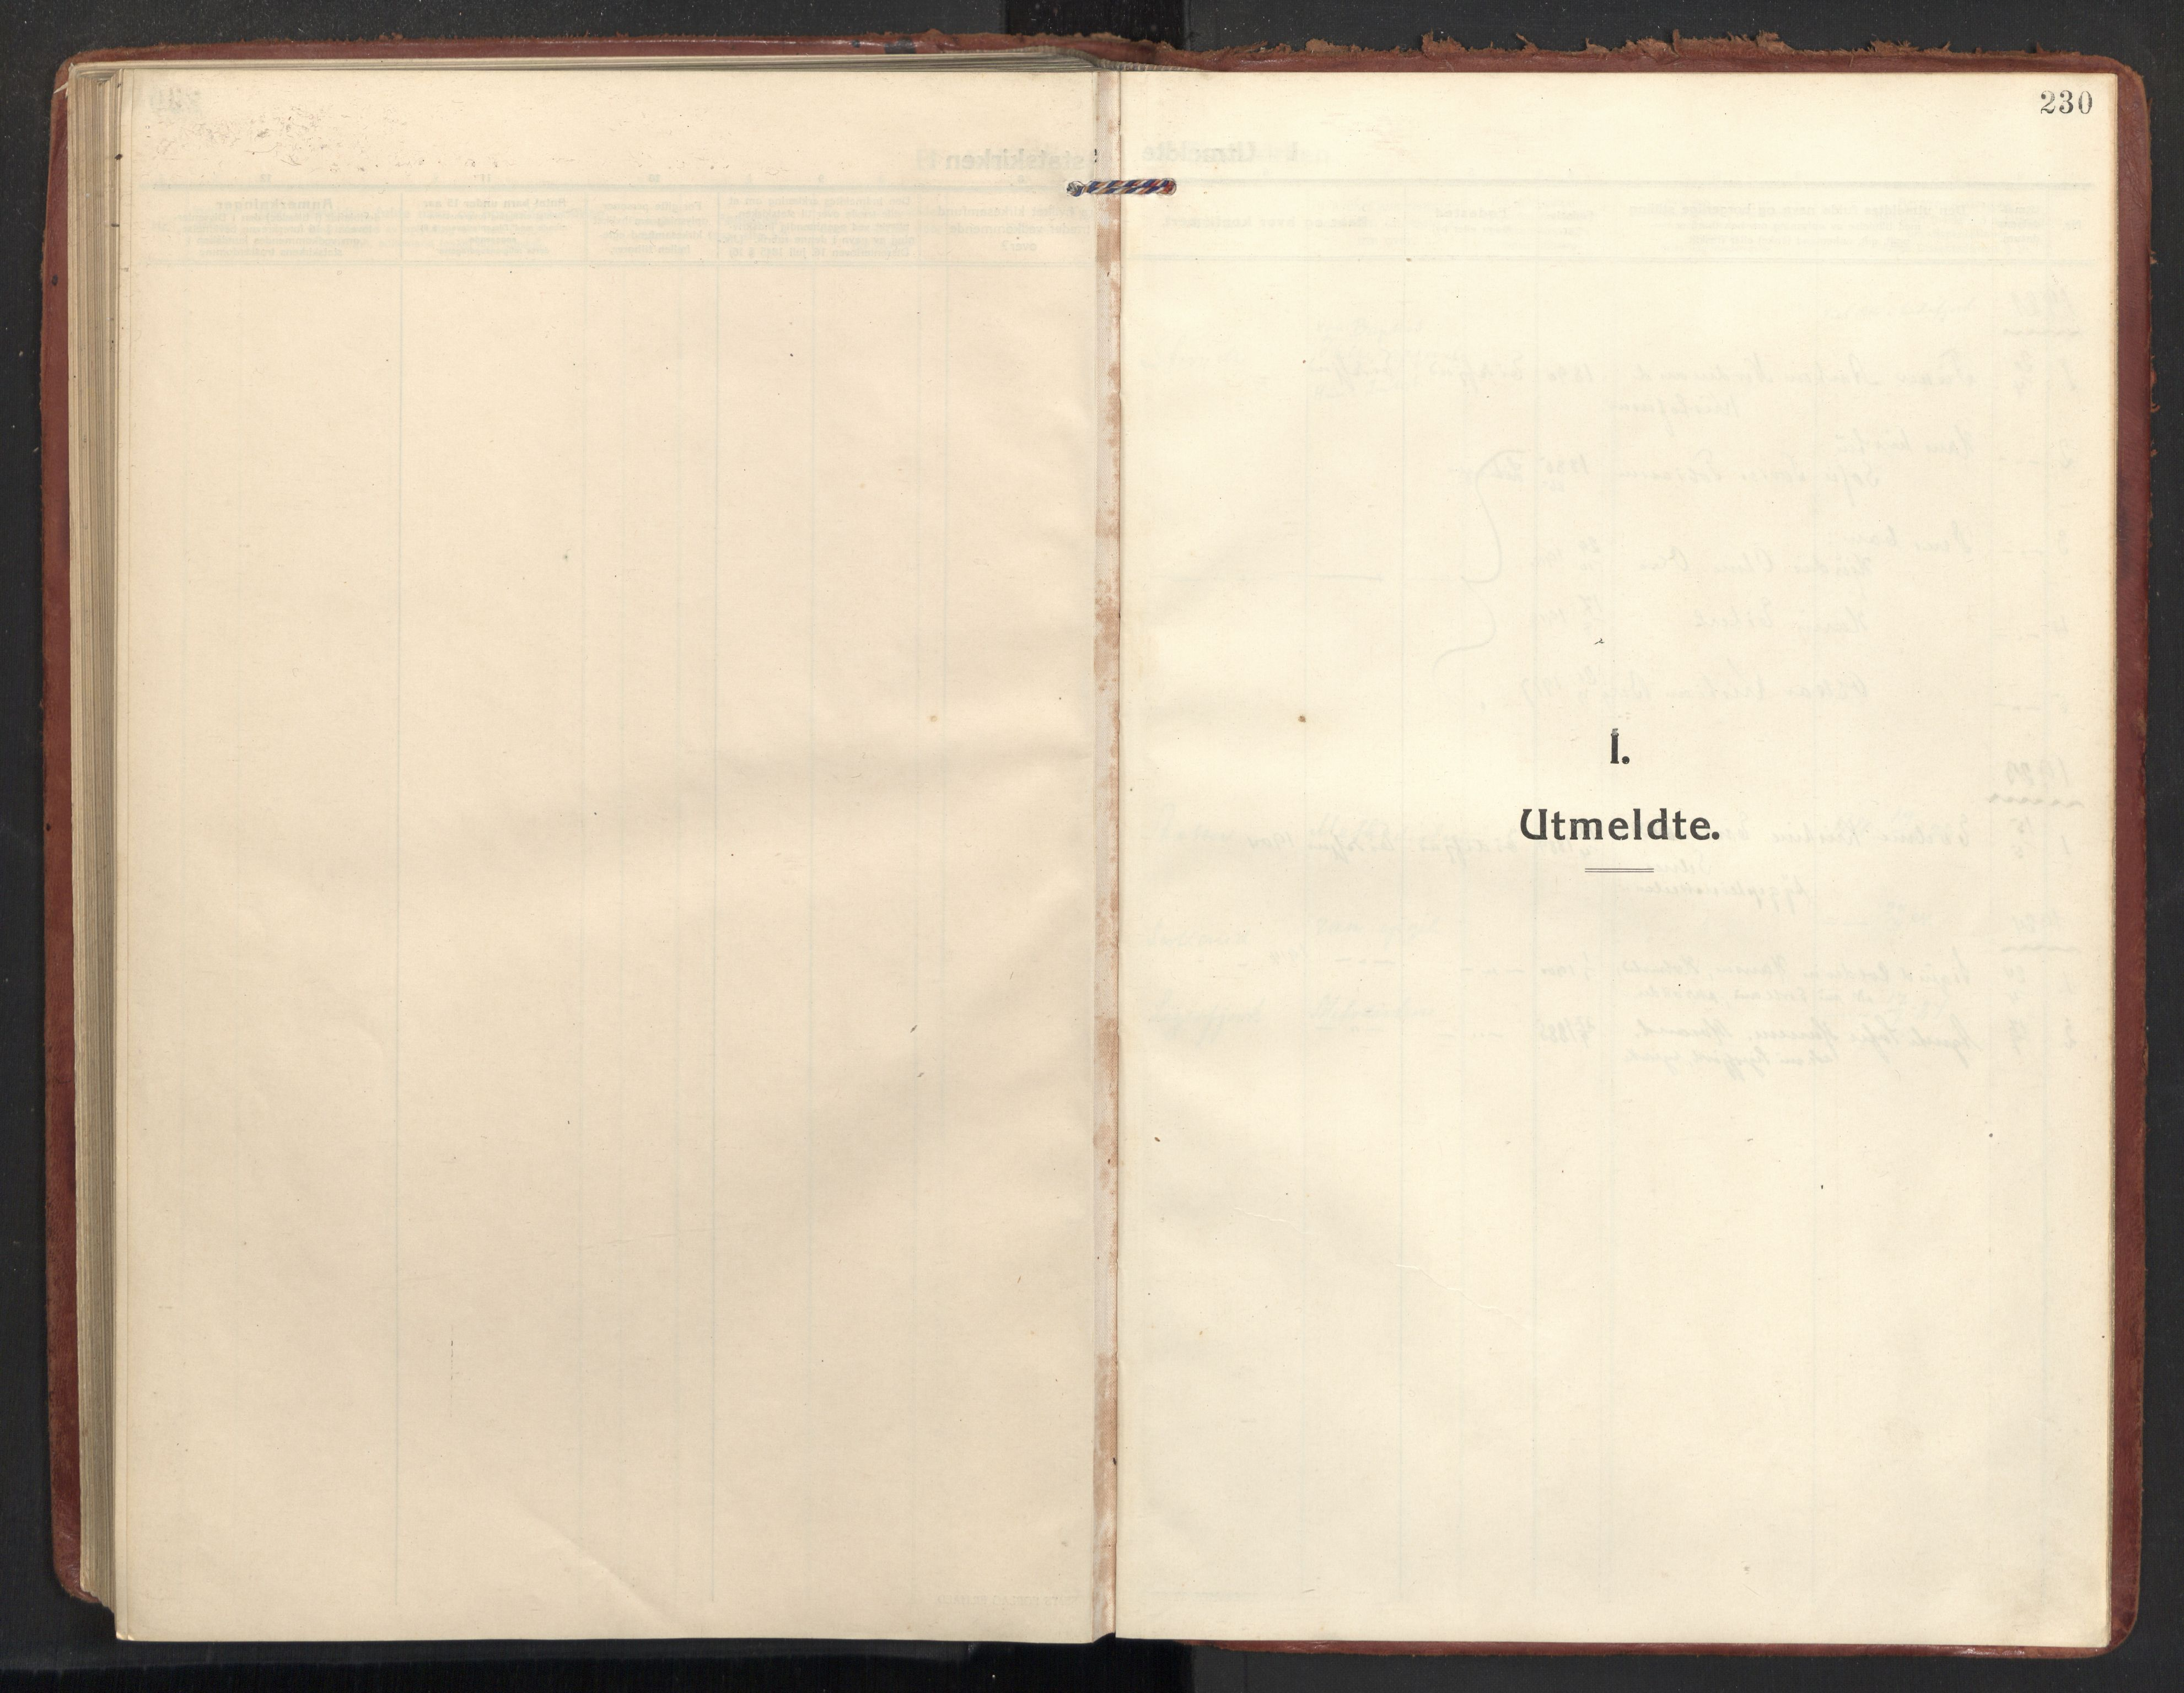 SAT, Ministerialprotokoller, klokkerbøker og fødselsregistre - Nordland, 890/L1288: Ministerialbok nr. 890A03, 1915-1925, s. 230